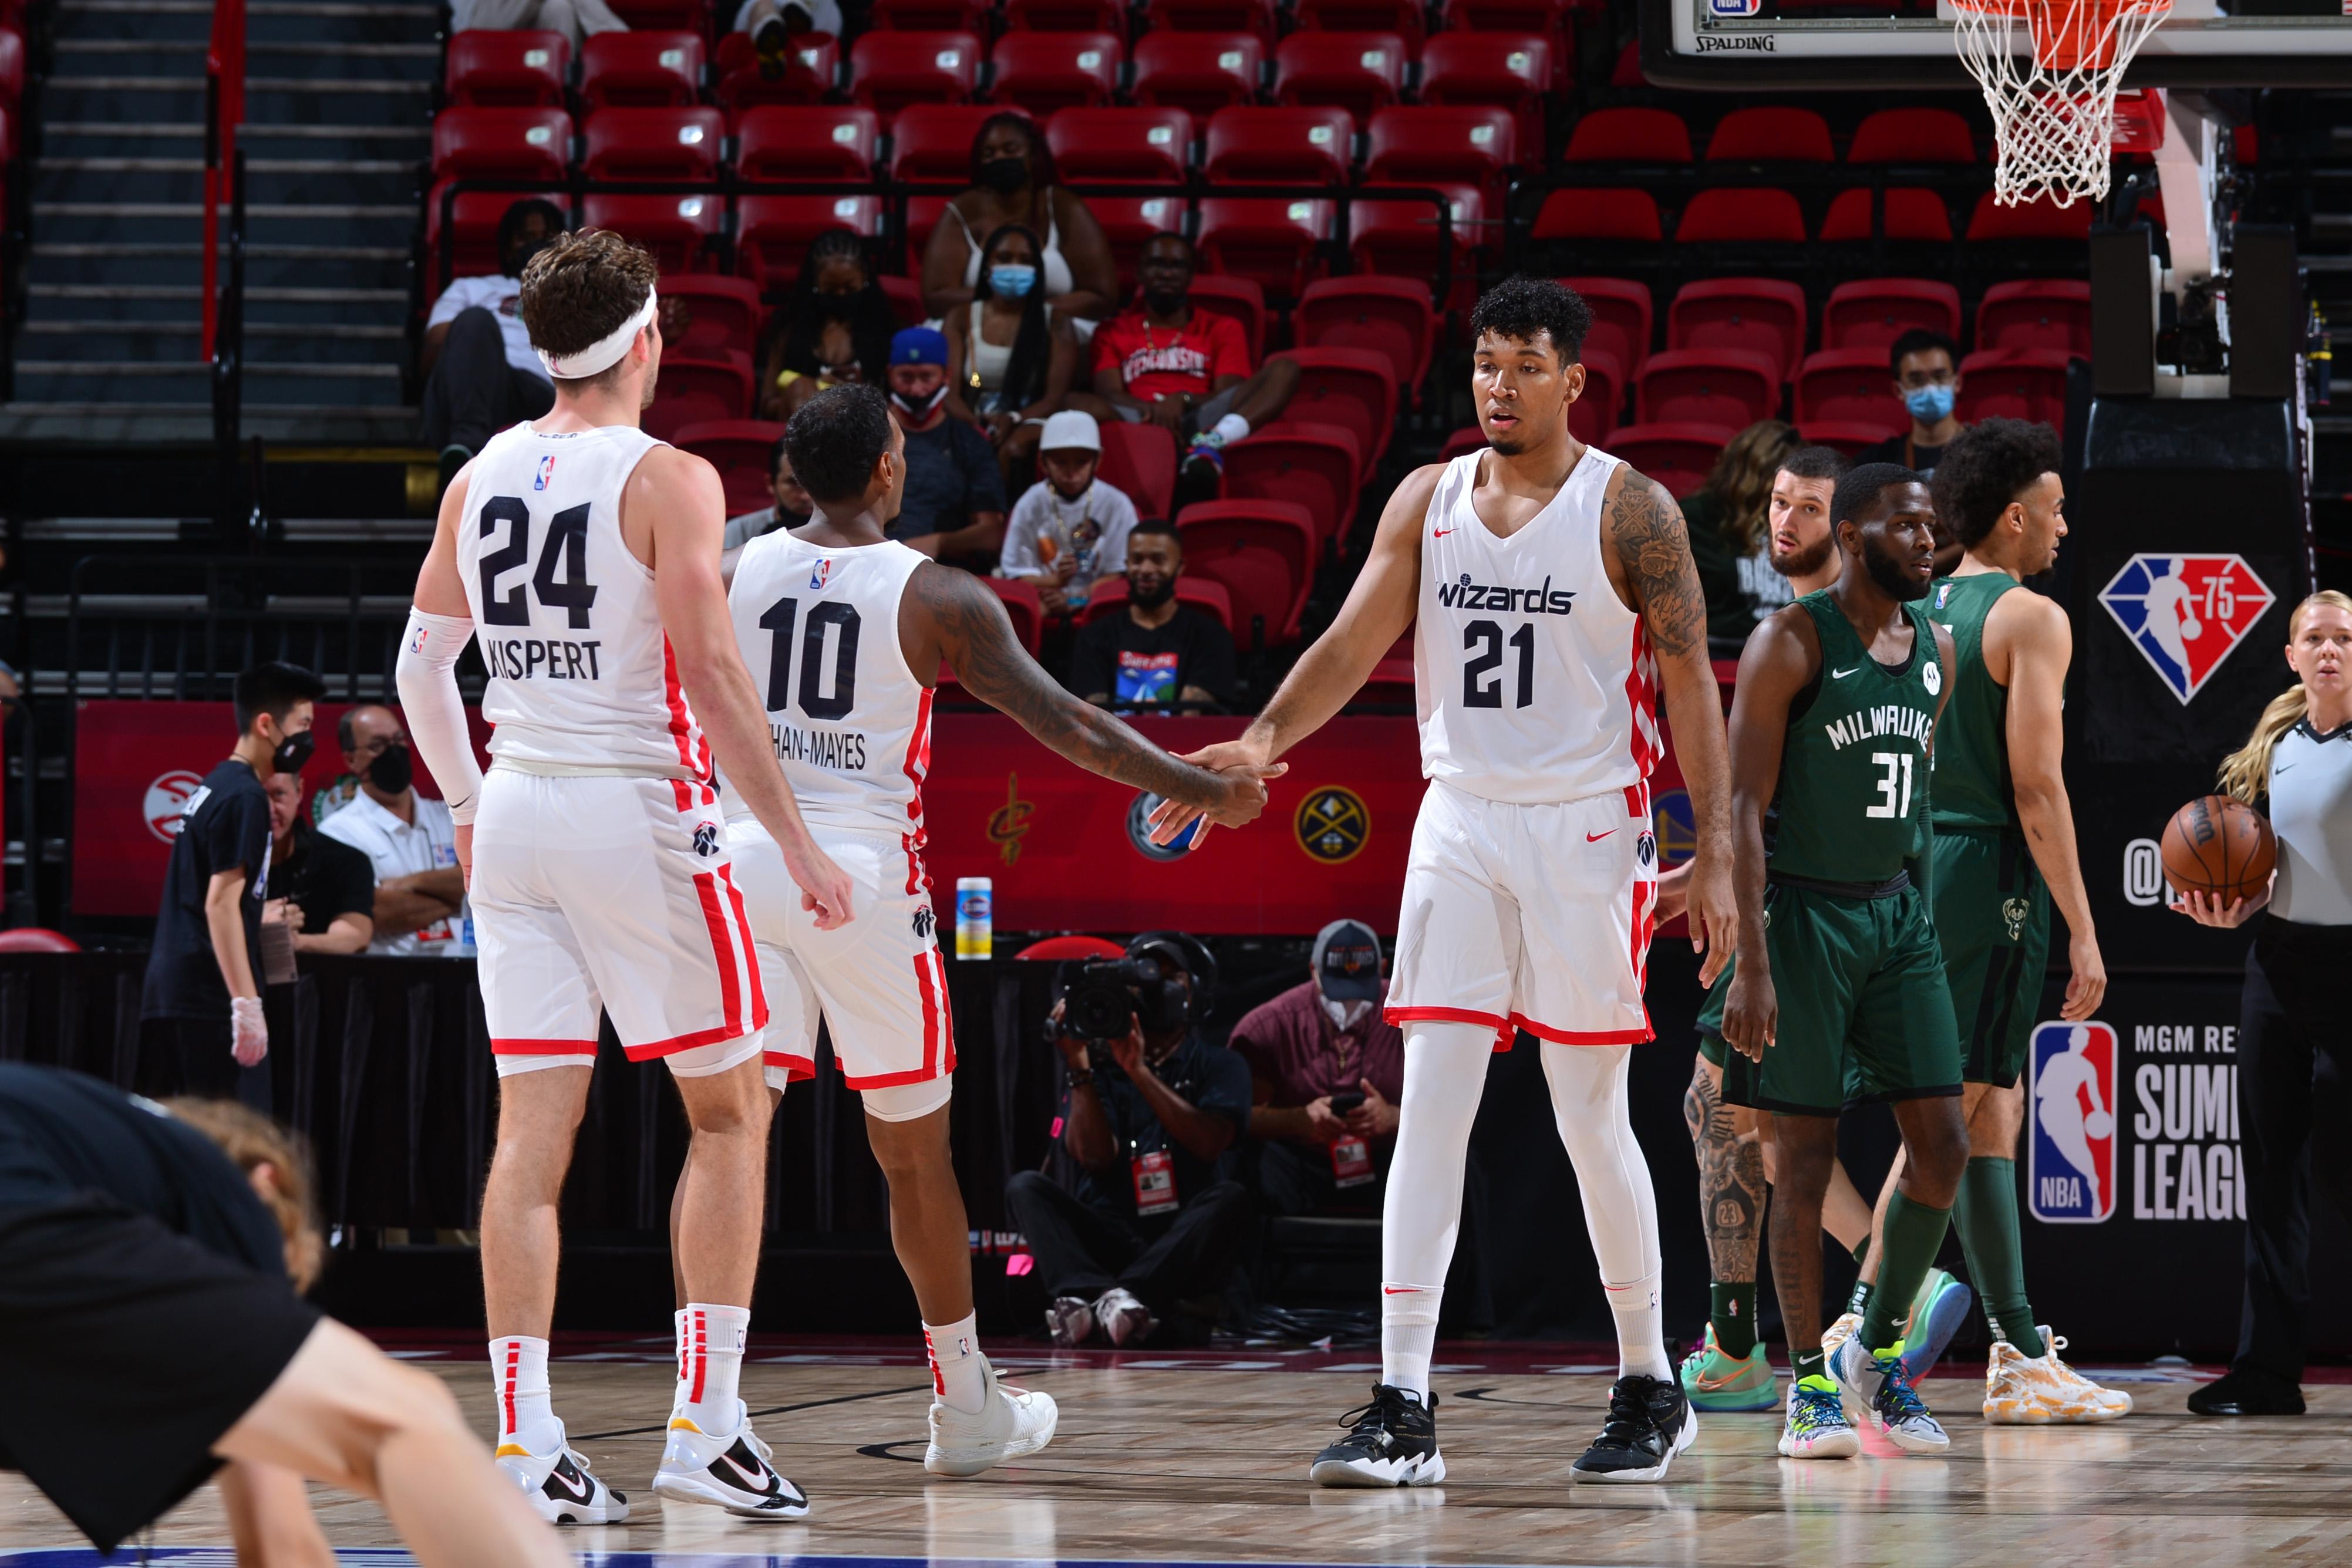 2021 Las Vegas Summer League - Milwaukee Bucks v Washington Wizards